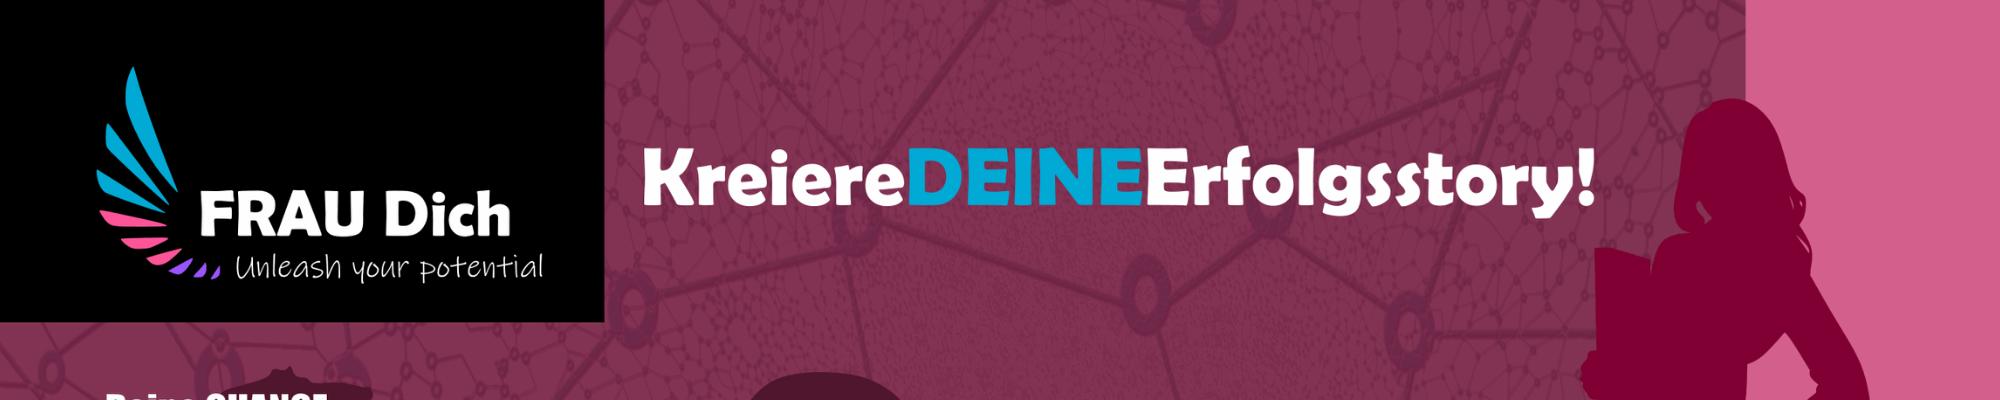 FRAU Dich - Kreiere DEINE Erfolgsstory!